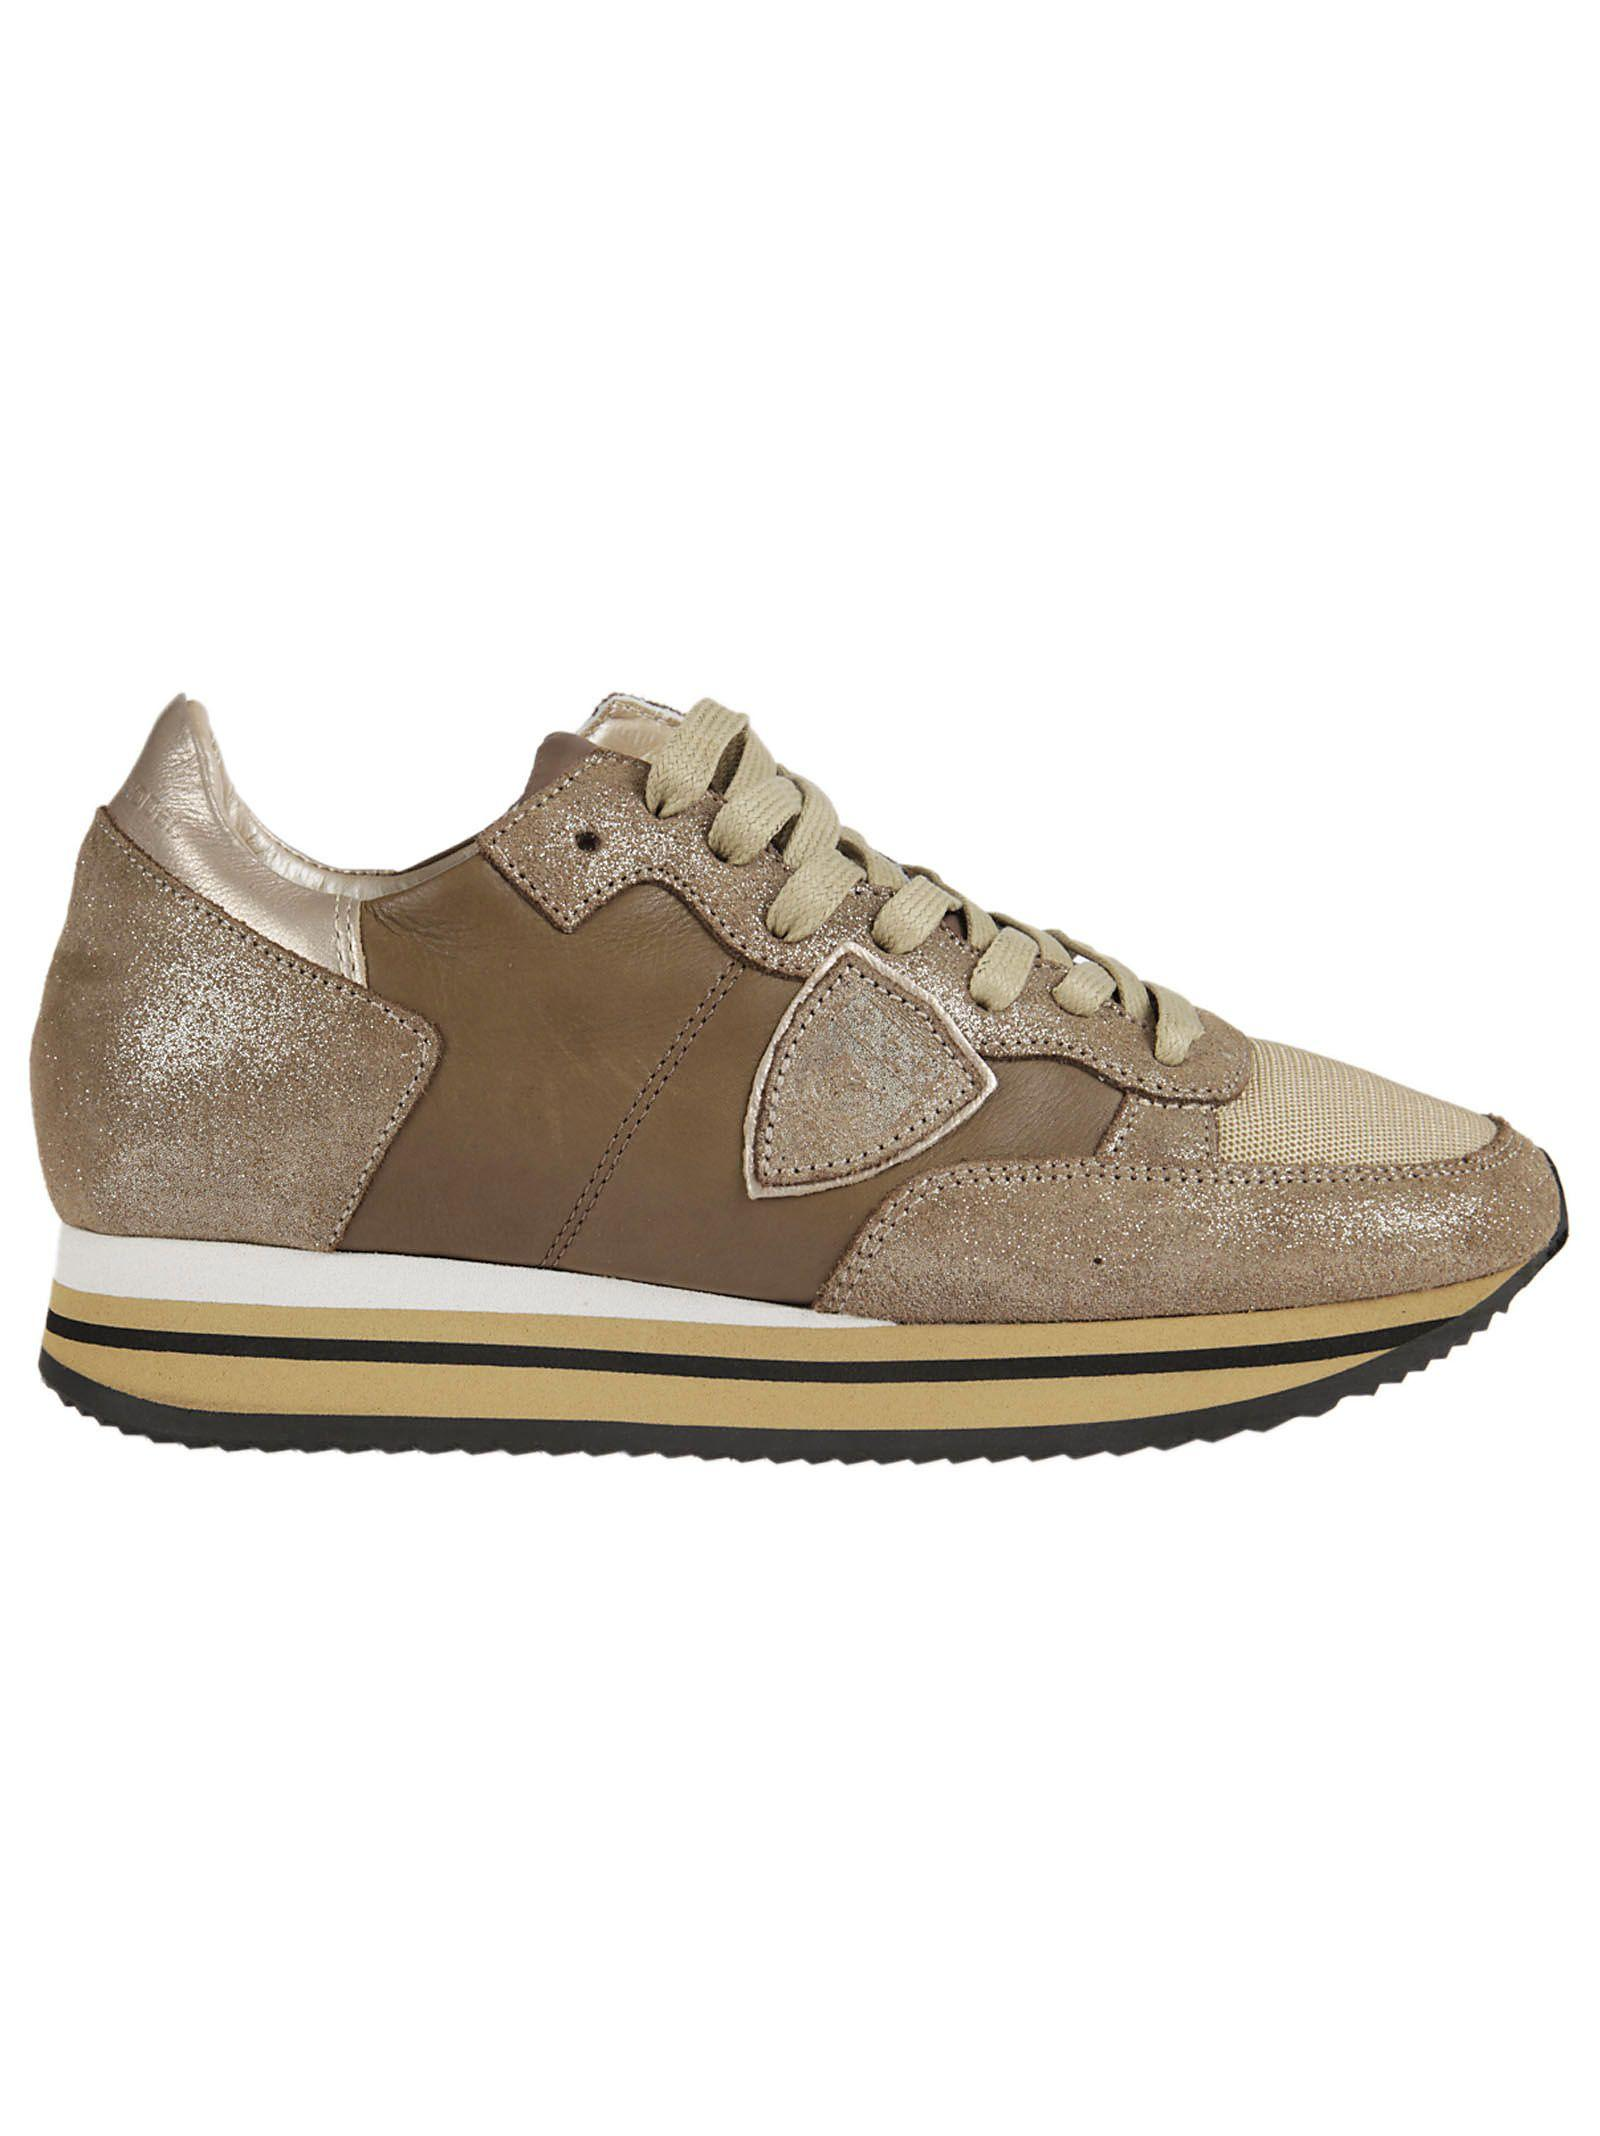 Philippe Model Tropez Sneakers In Mud